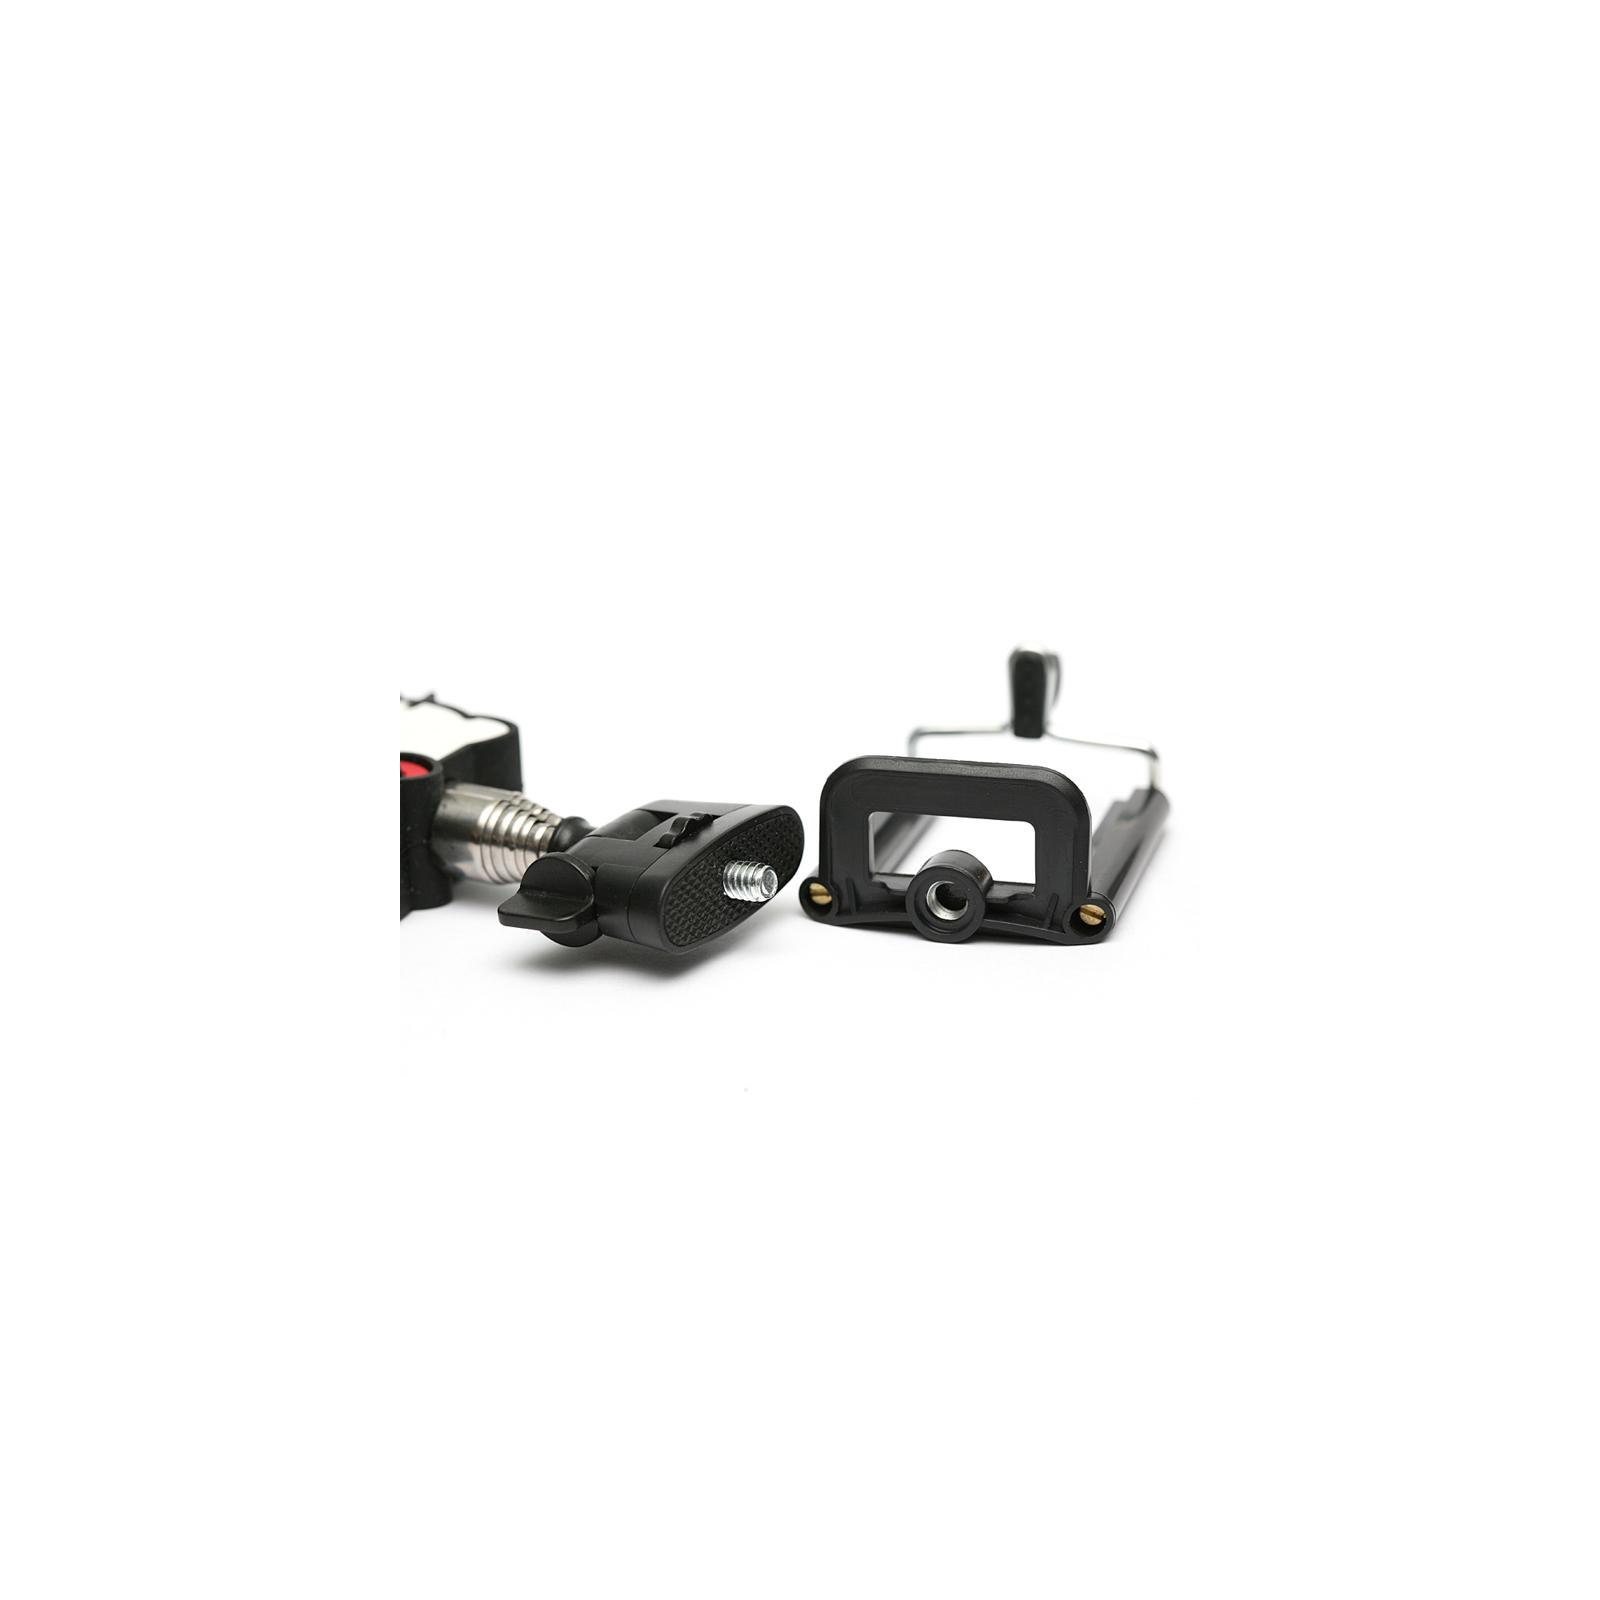 Монопод для селфи Selfi Monopod ISM-03C со шнуром AUX PowerPlant (ISM03C) изображение 5